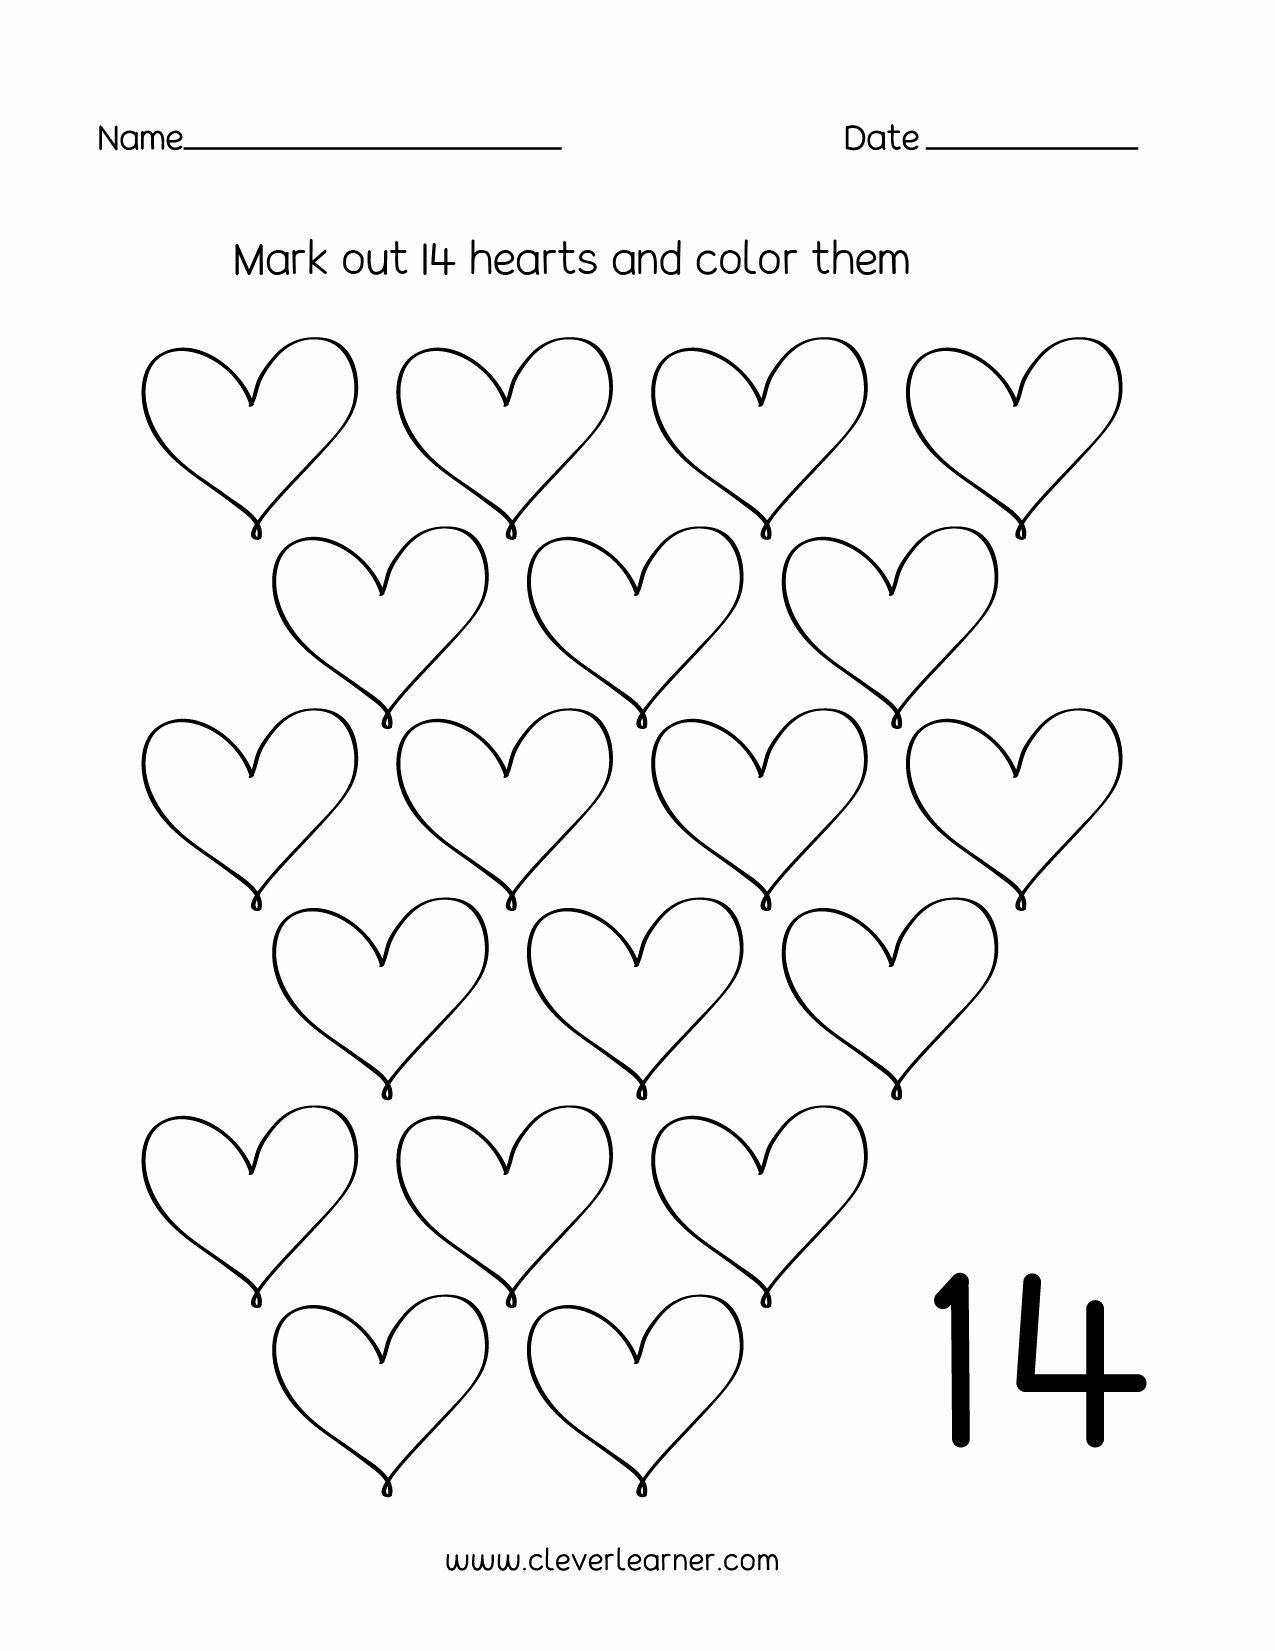 Tracing Preschool Worksheets Number 14 Preschool Number Worksheets Preschool Worksheets Number 14 [ 1651 x 1275 Pixel ]